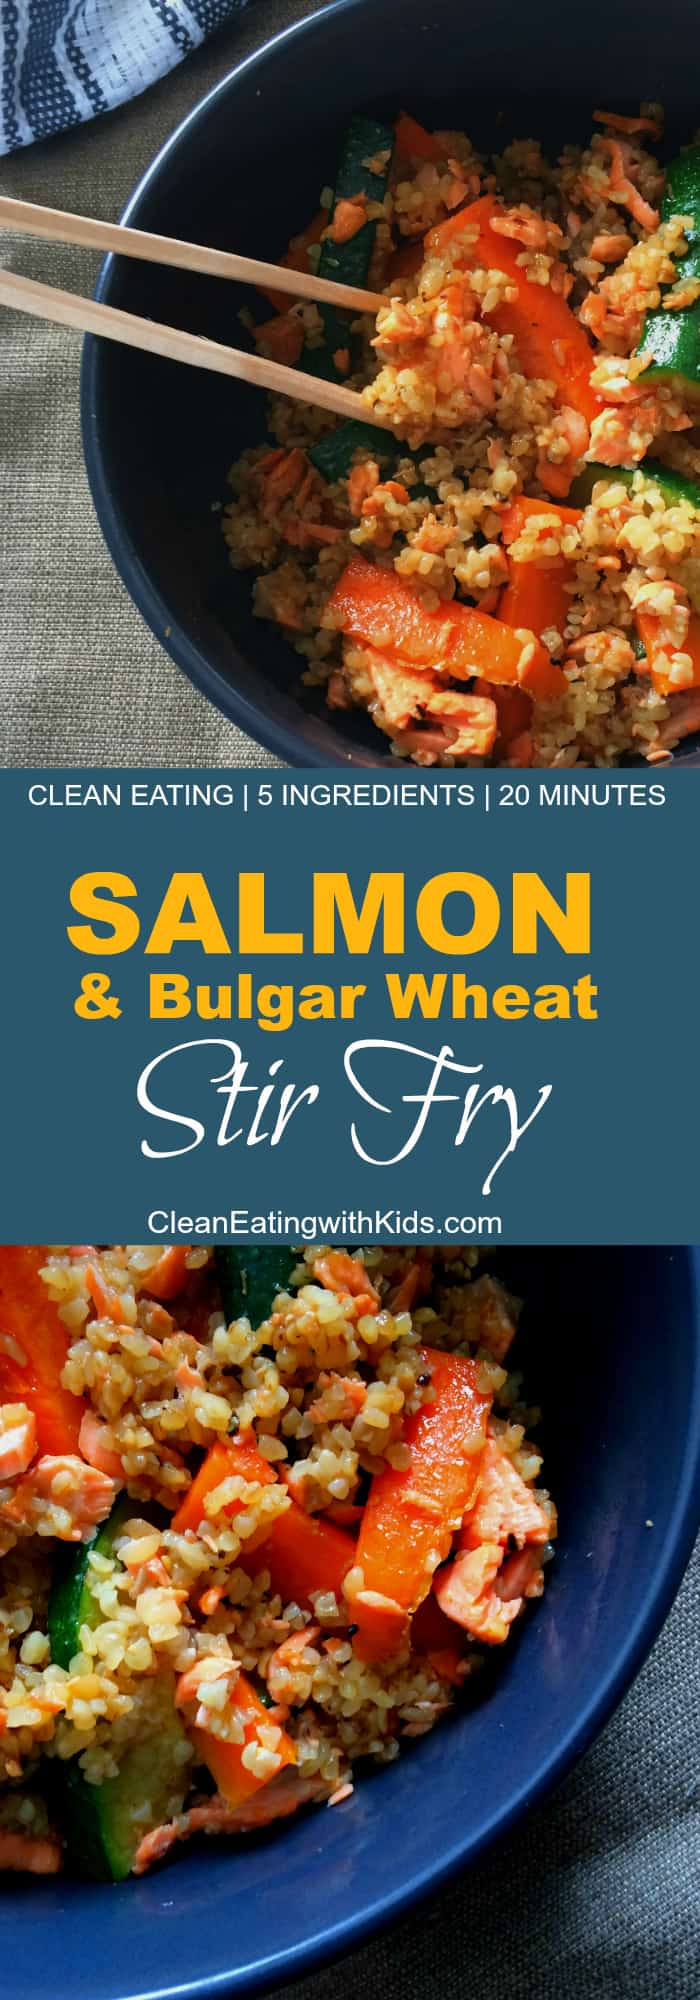 clean eating salmon and bulgar wheat stirfry